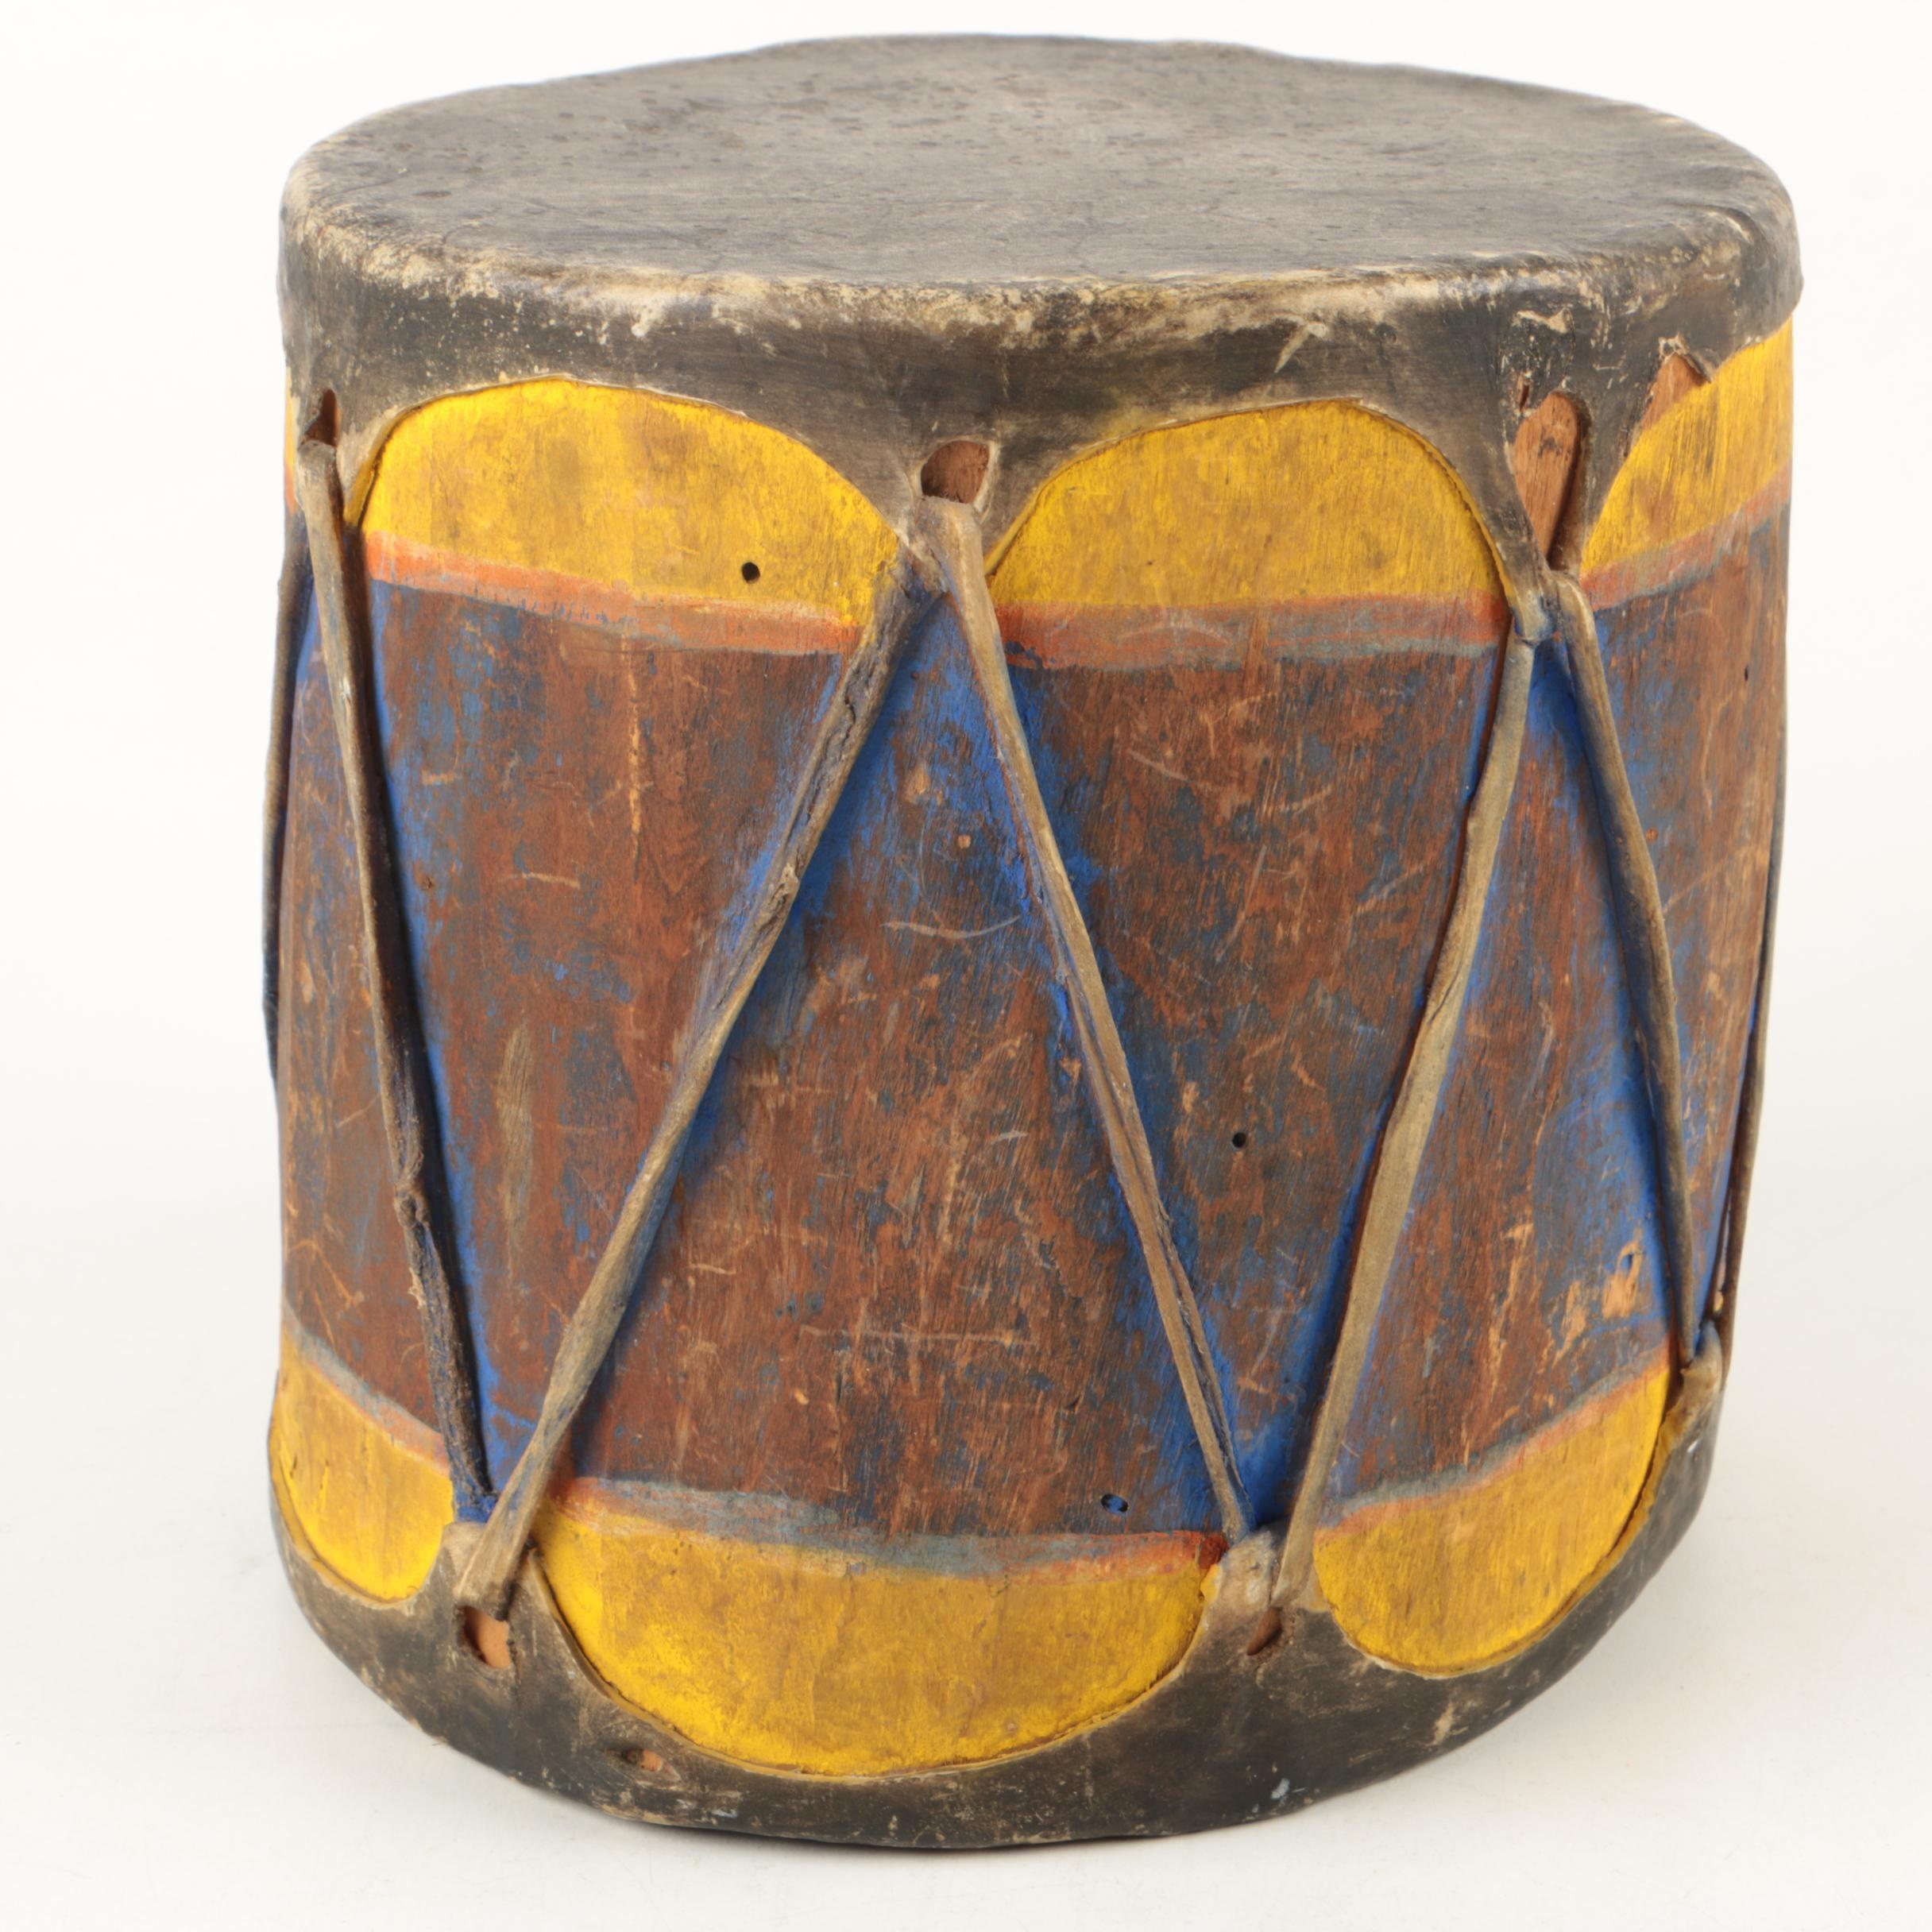 Vintage Handcrafted Cochiti Pueblo Style Log Drum